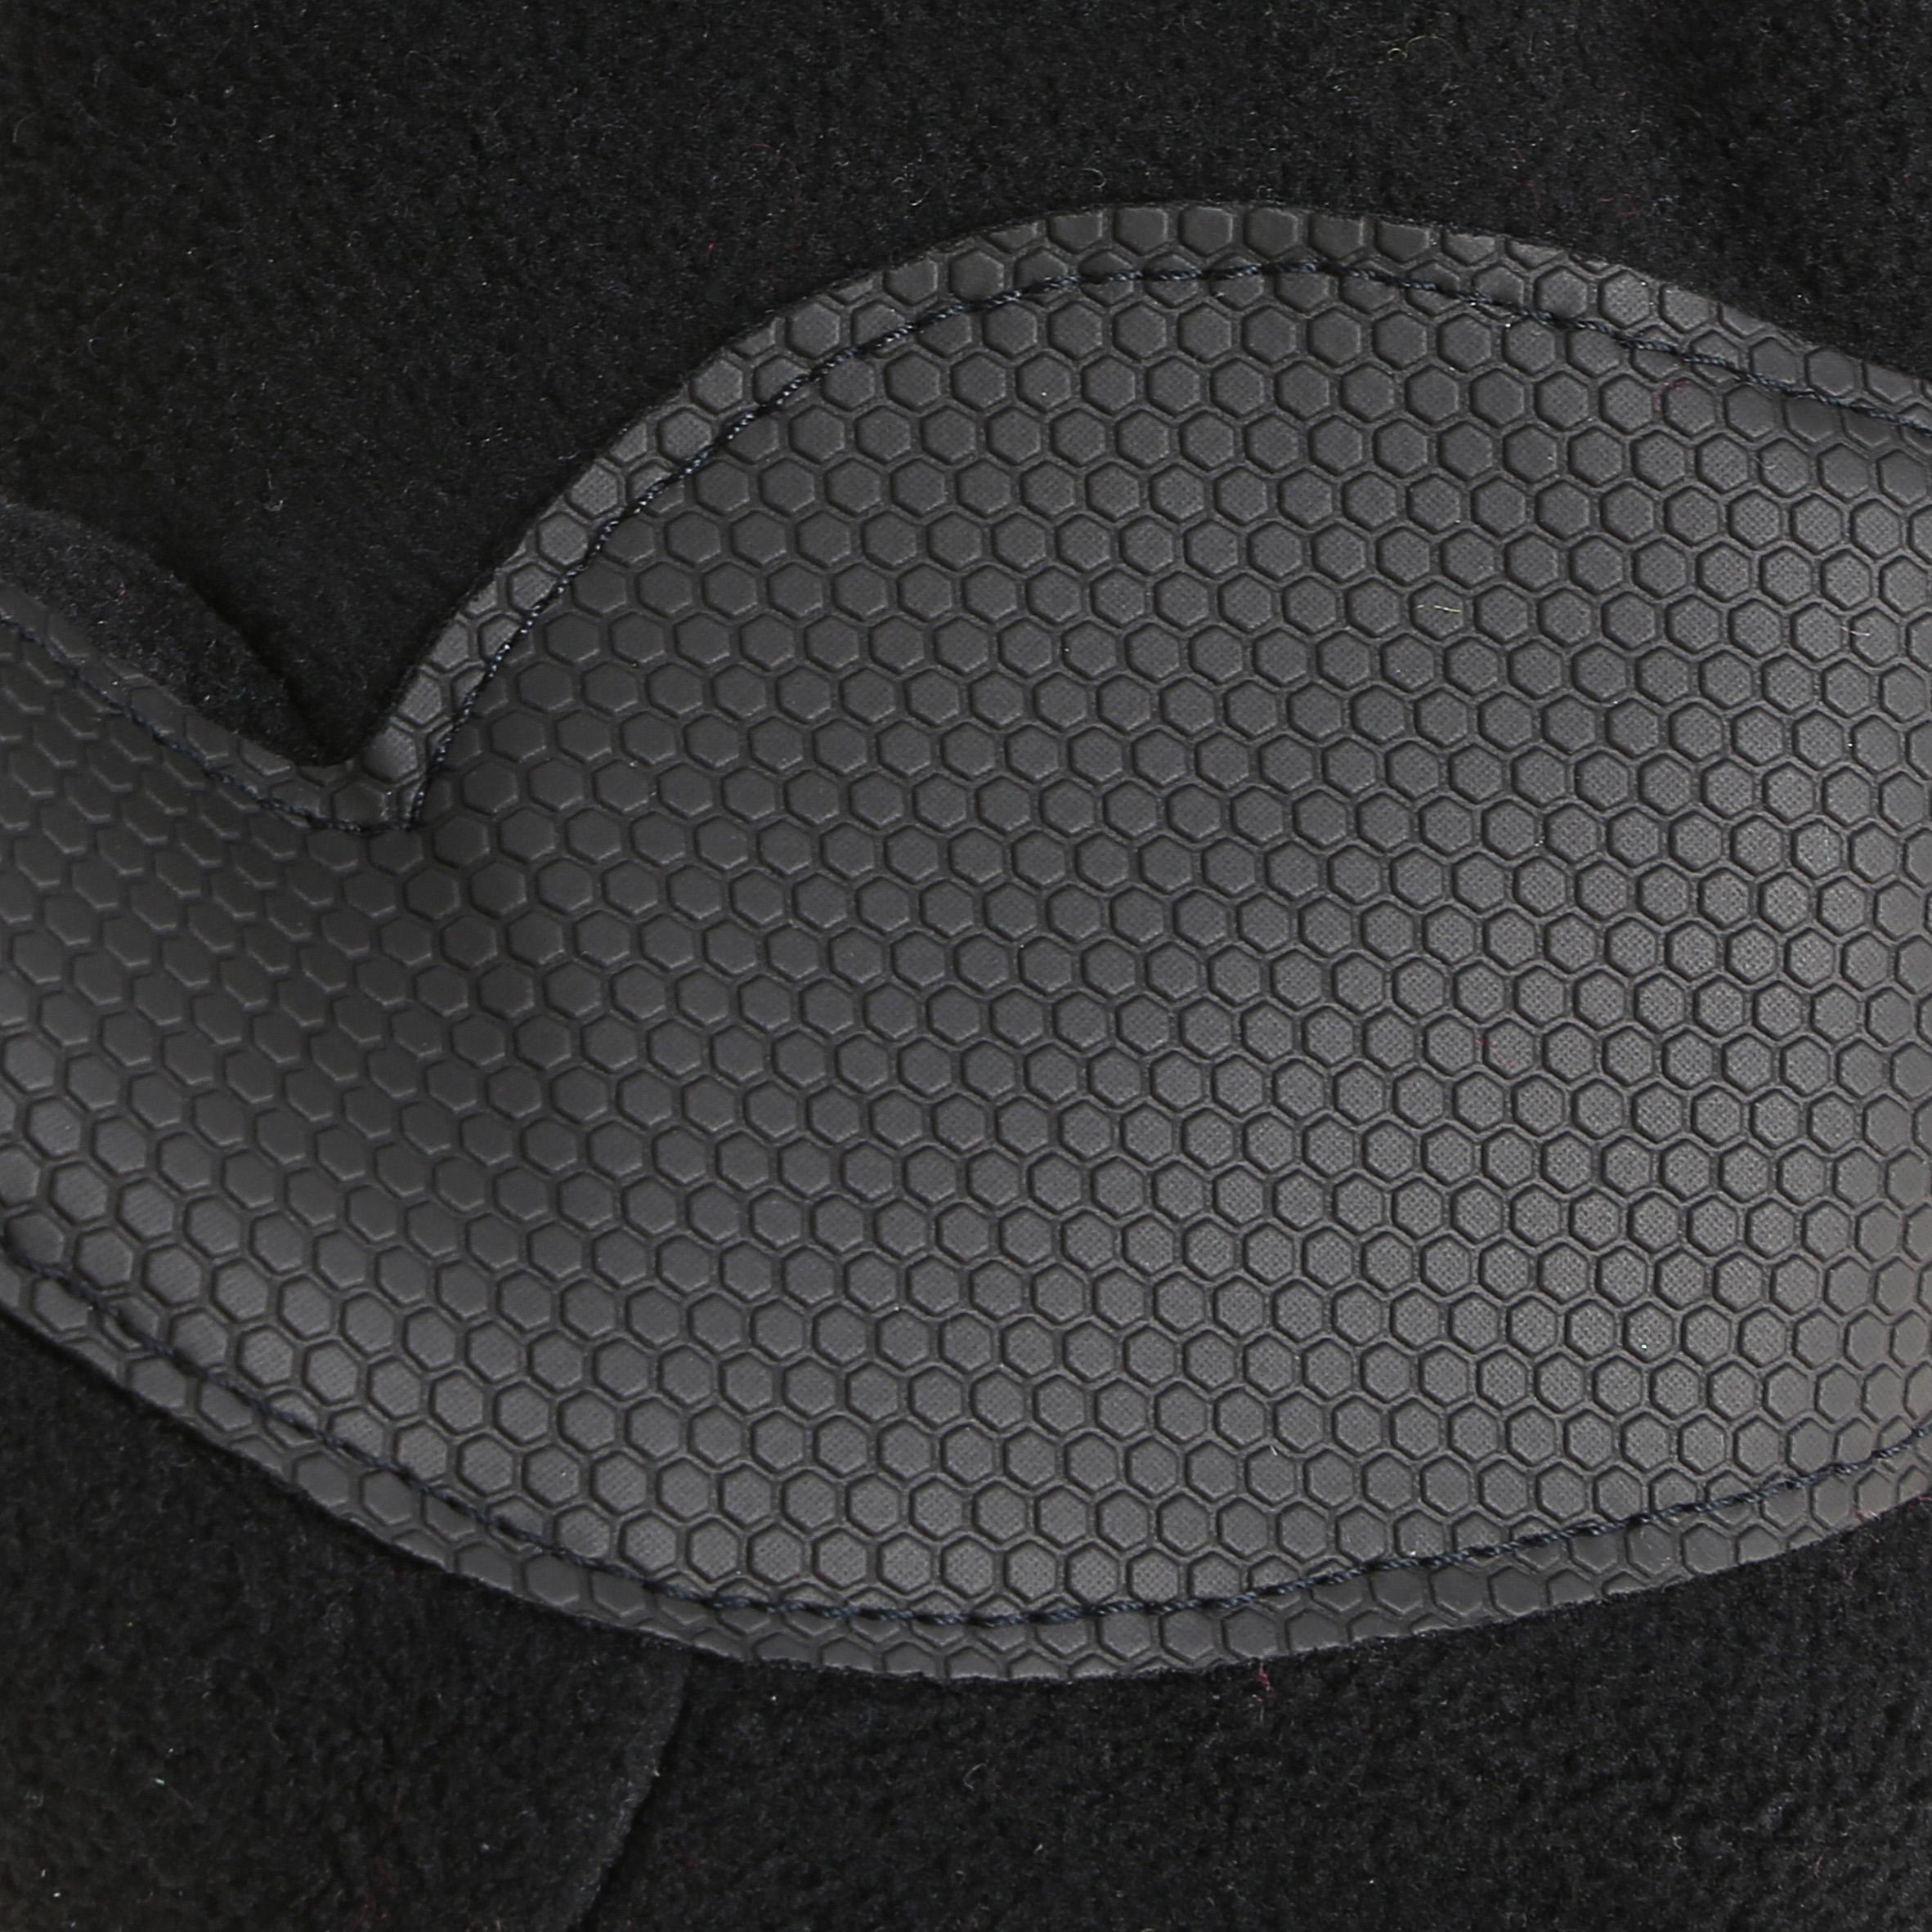 SH100 warm black junior hiking fleece gloves